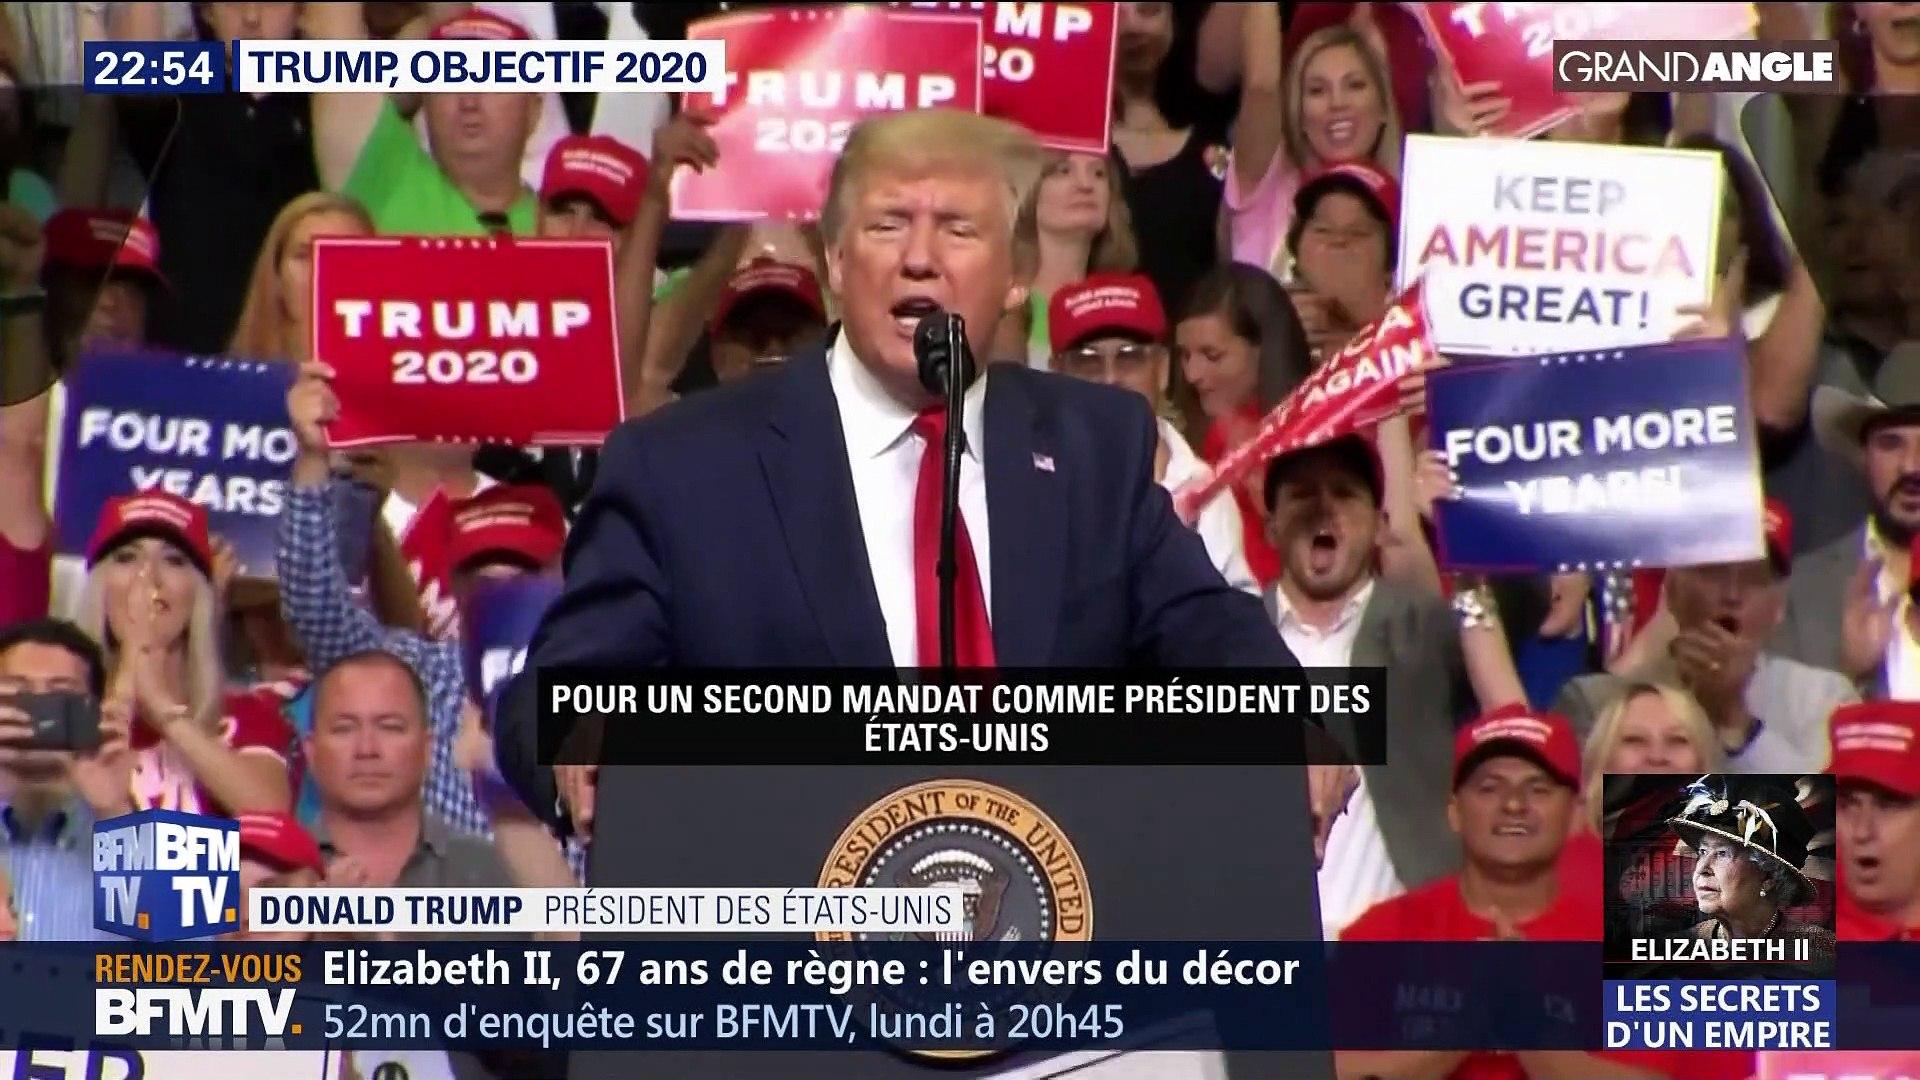 Donald Trump, objectif 2020